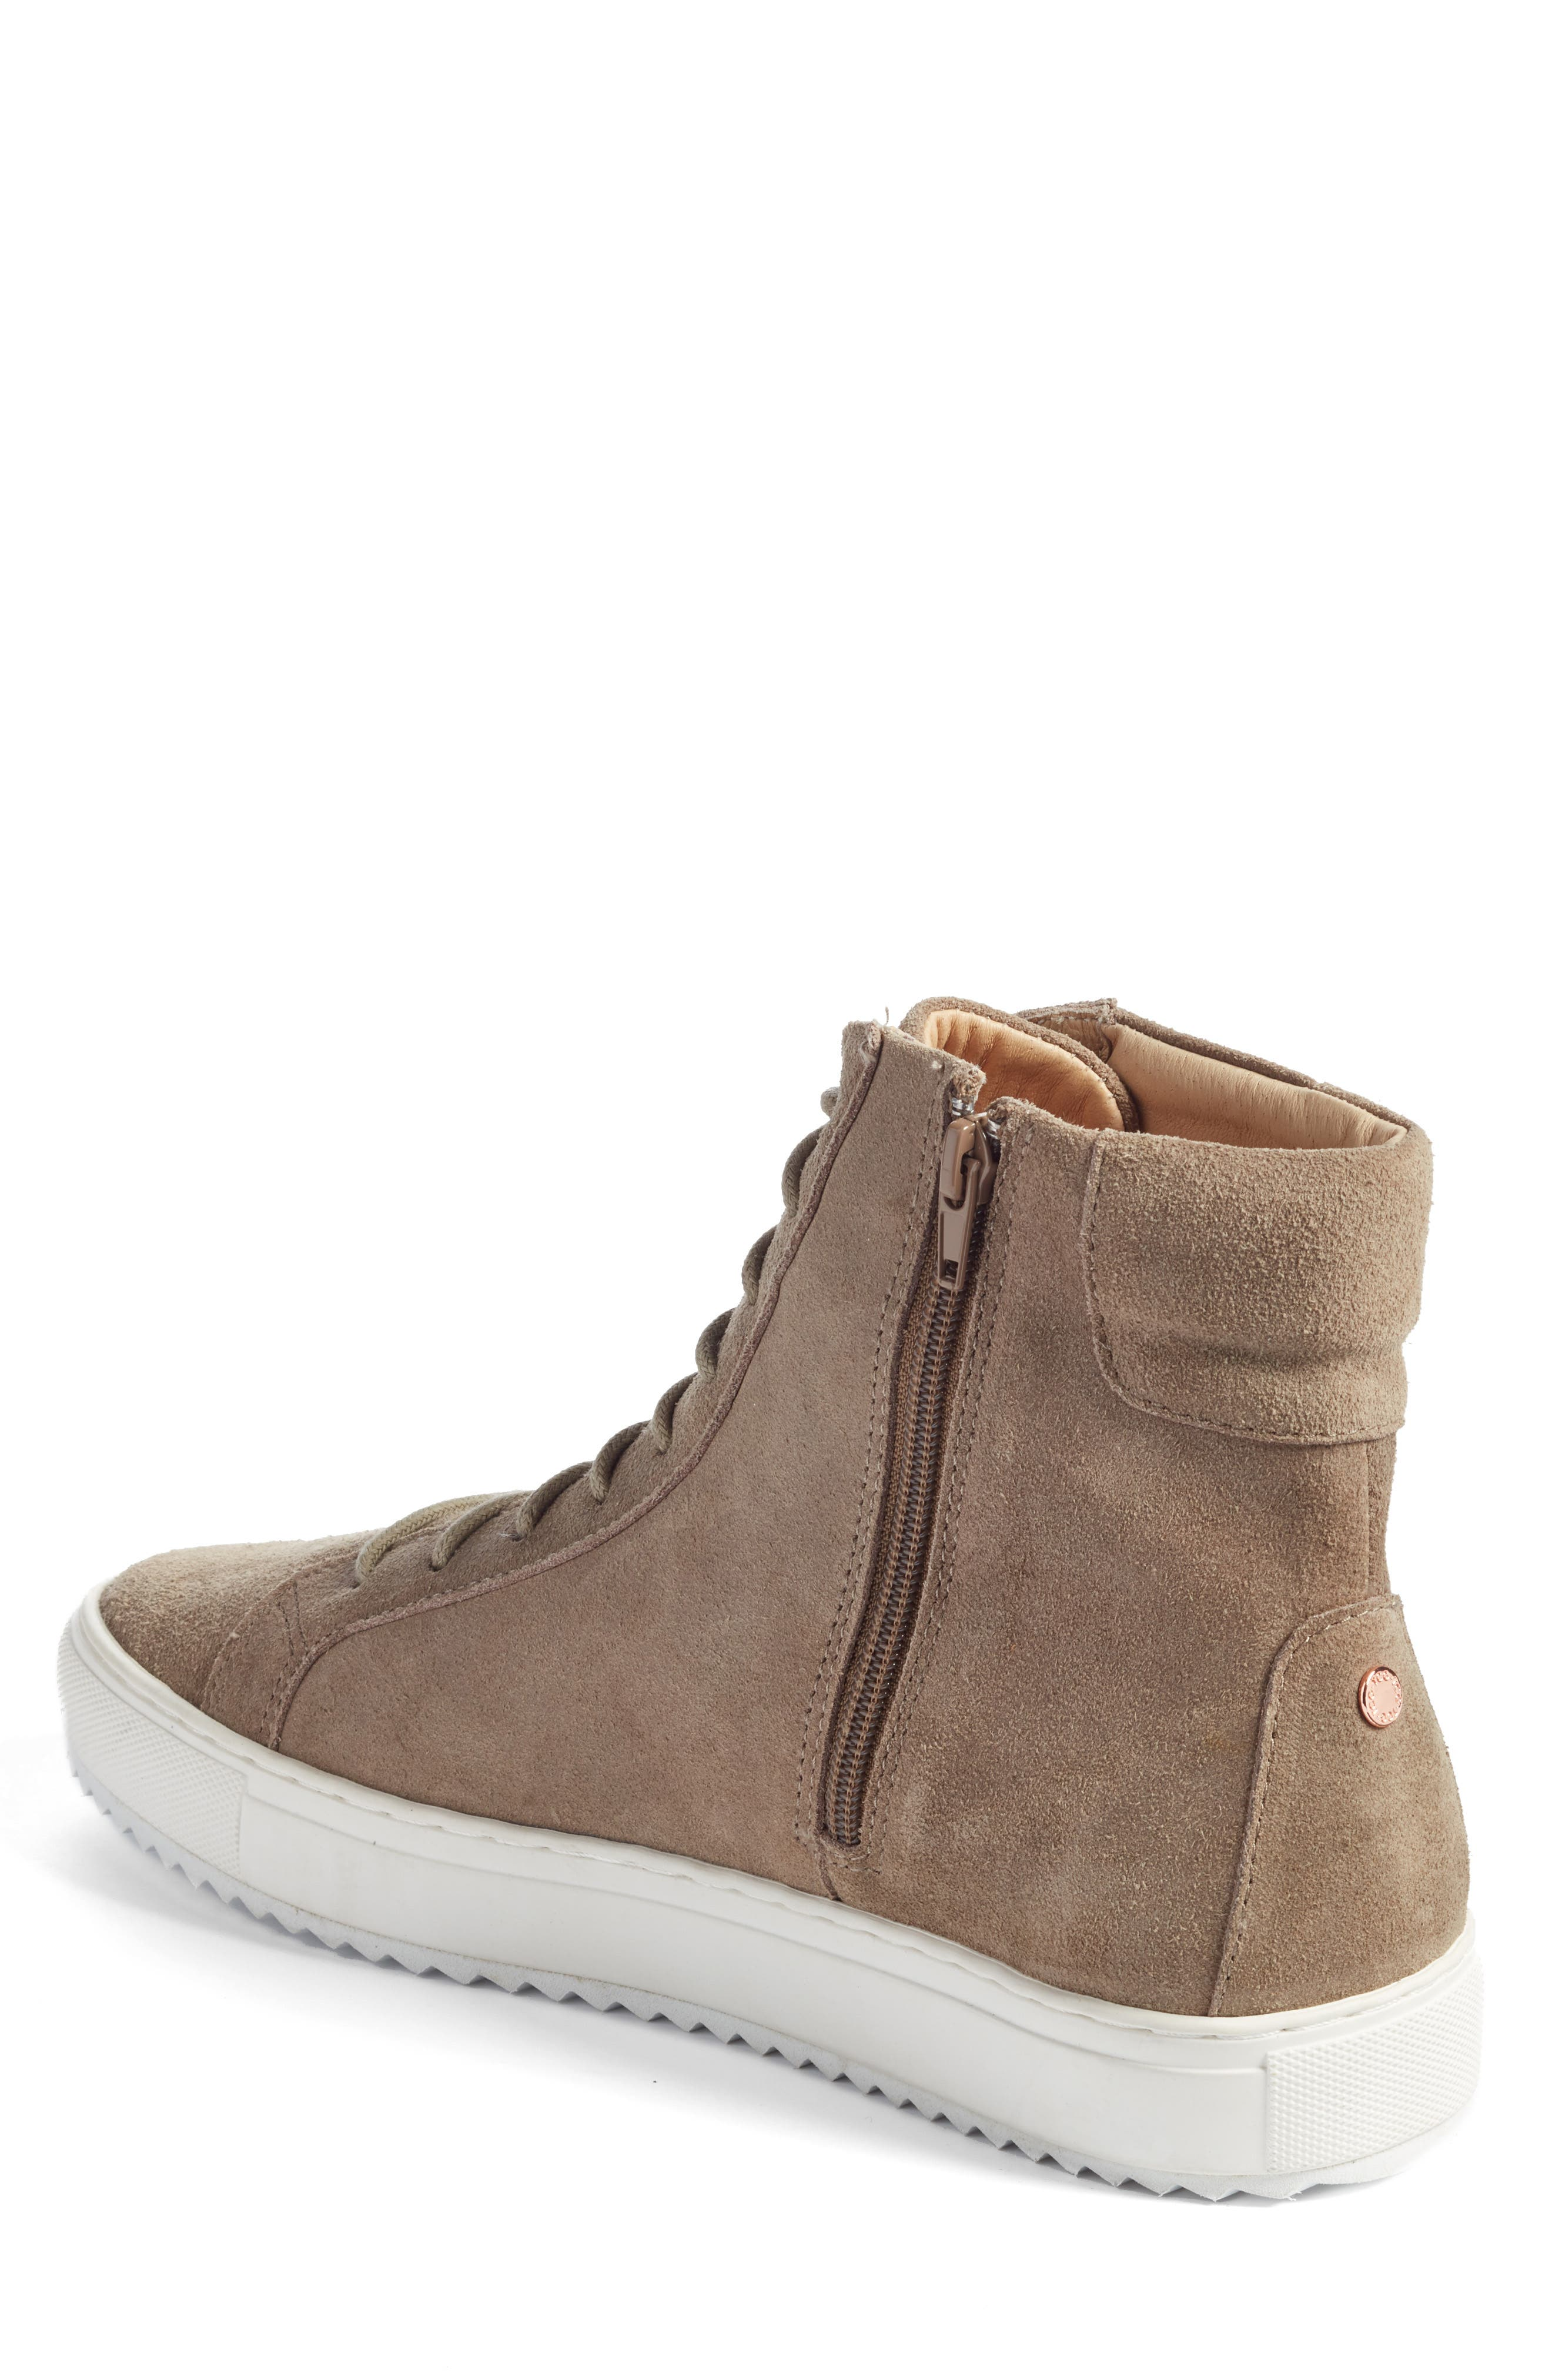 Alternate Image 2  - TCG Logan Water Resistant High Top Sneaker (Men)